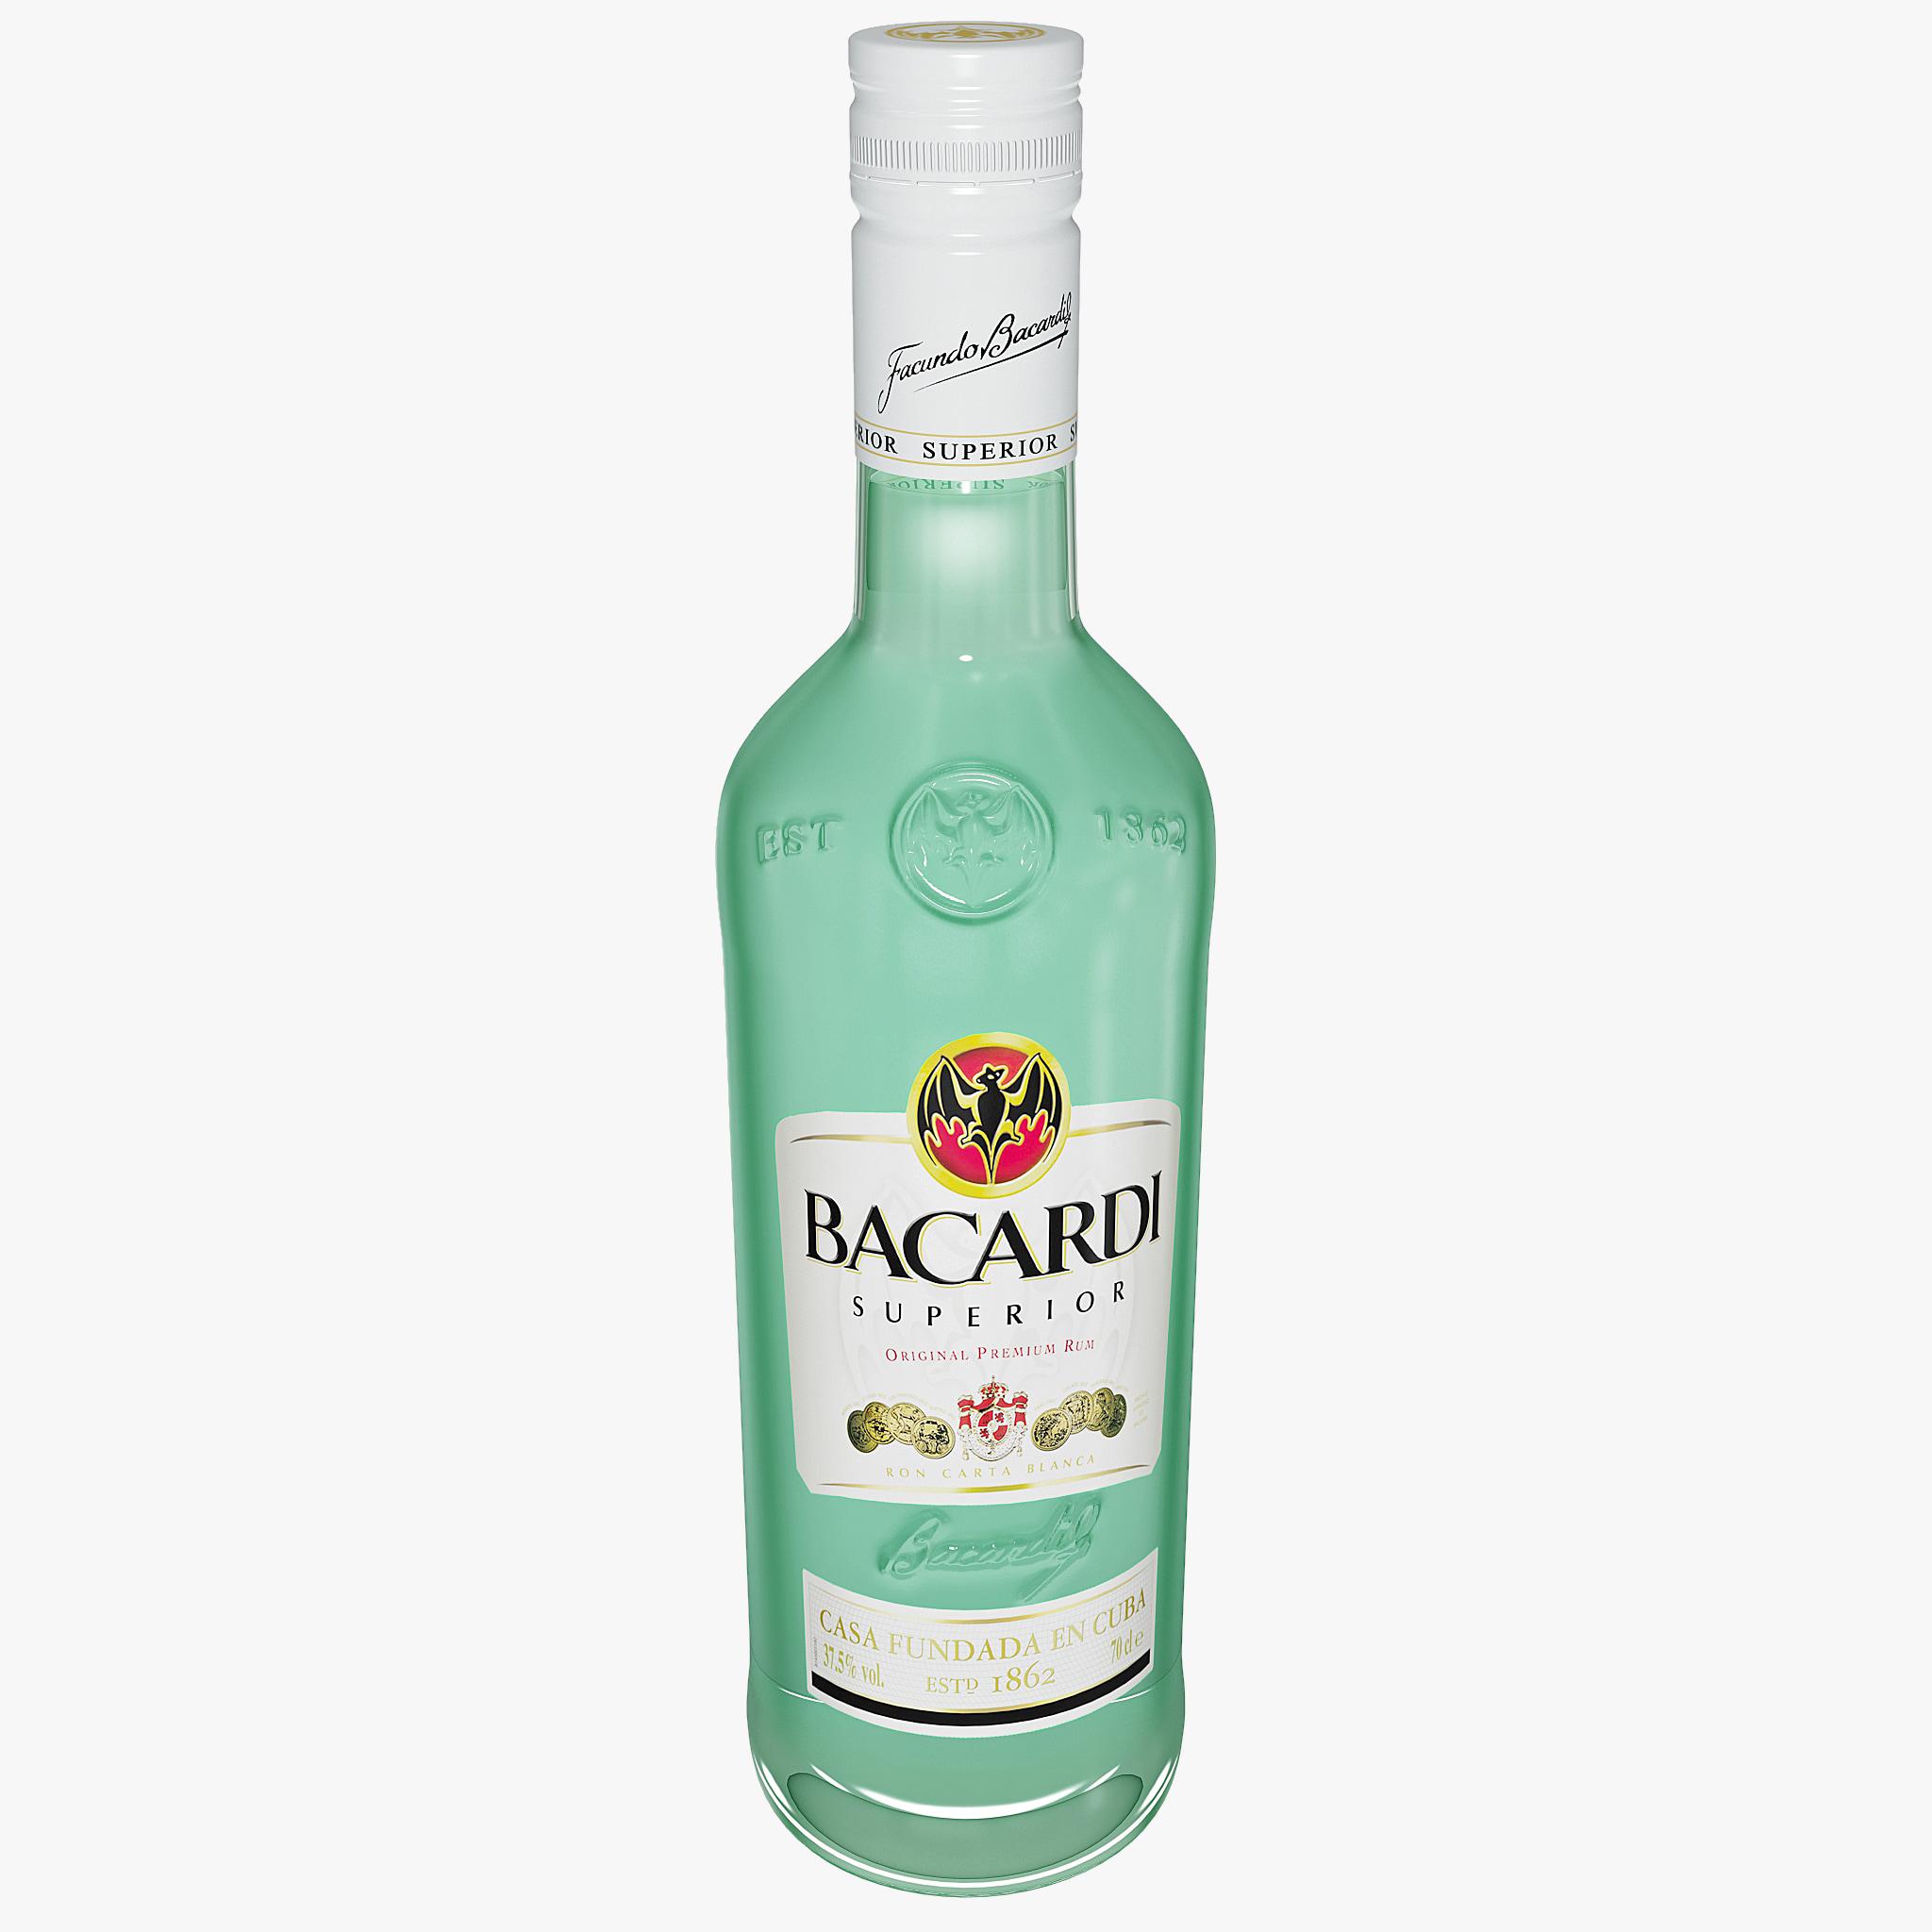 253319_Bacardi_Bottle_of_Rum_000.jpg: www.turbosquid.com/3d-models/3d-c4d-bacardi-bottle-rum/744996